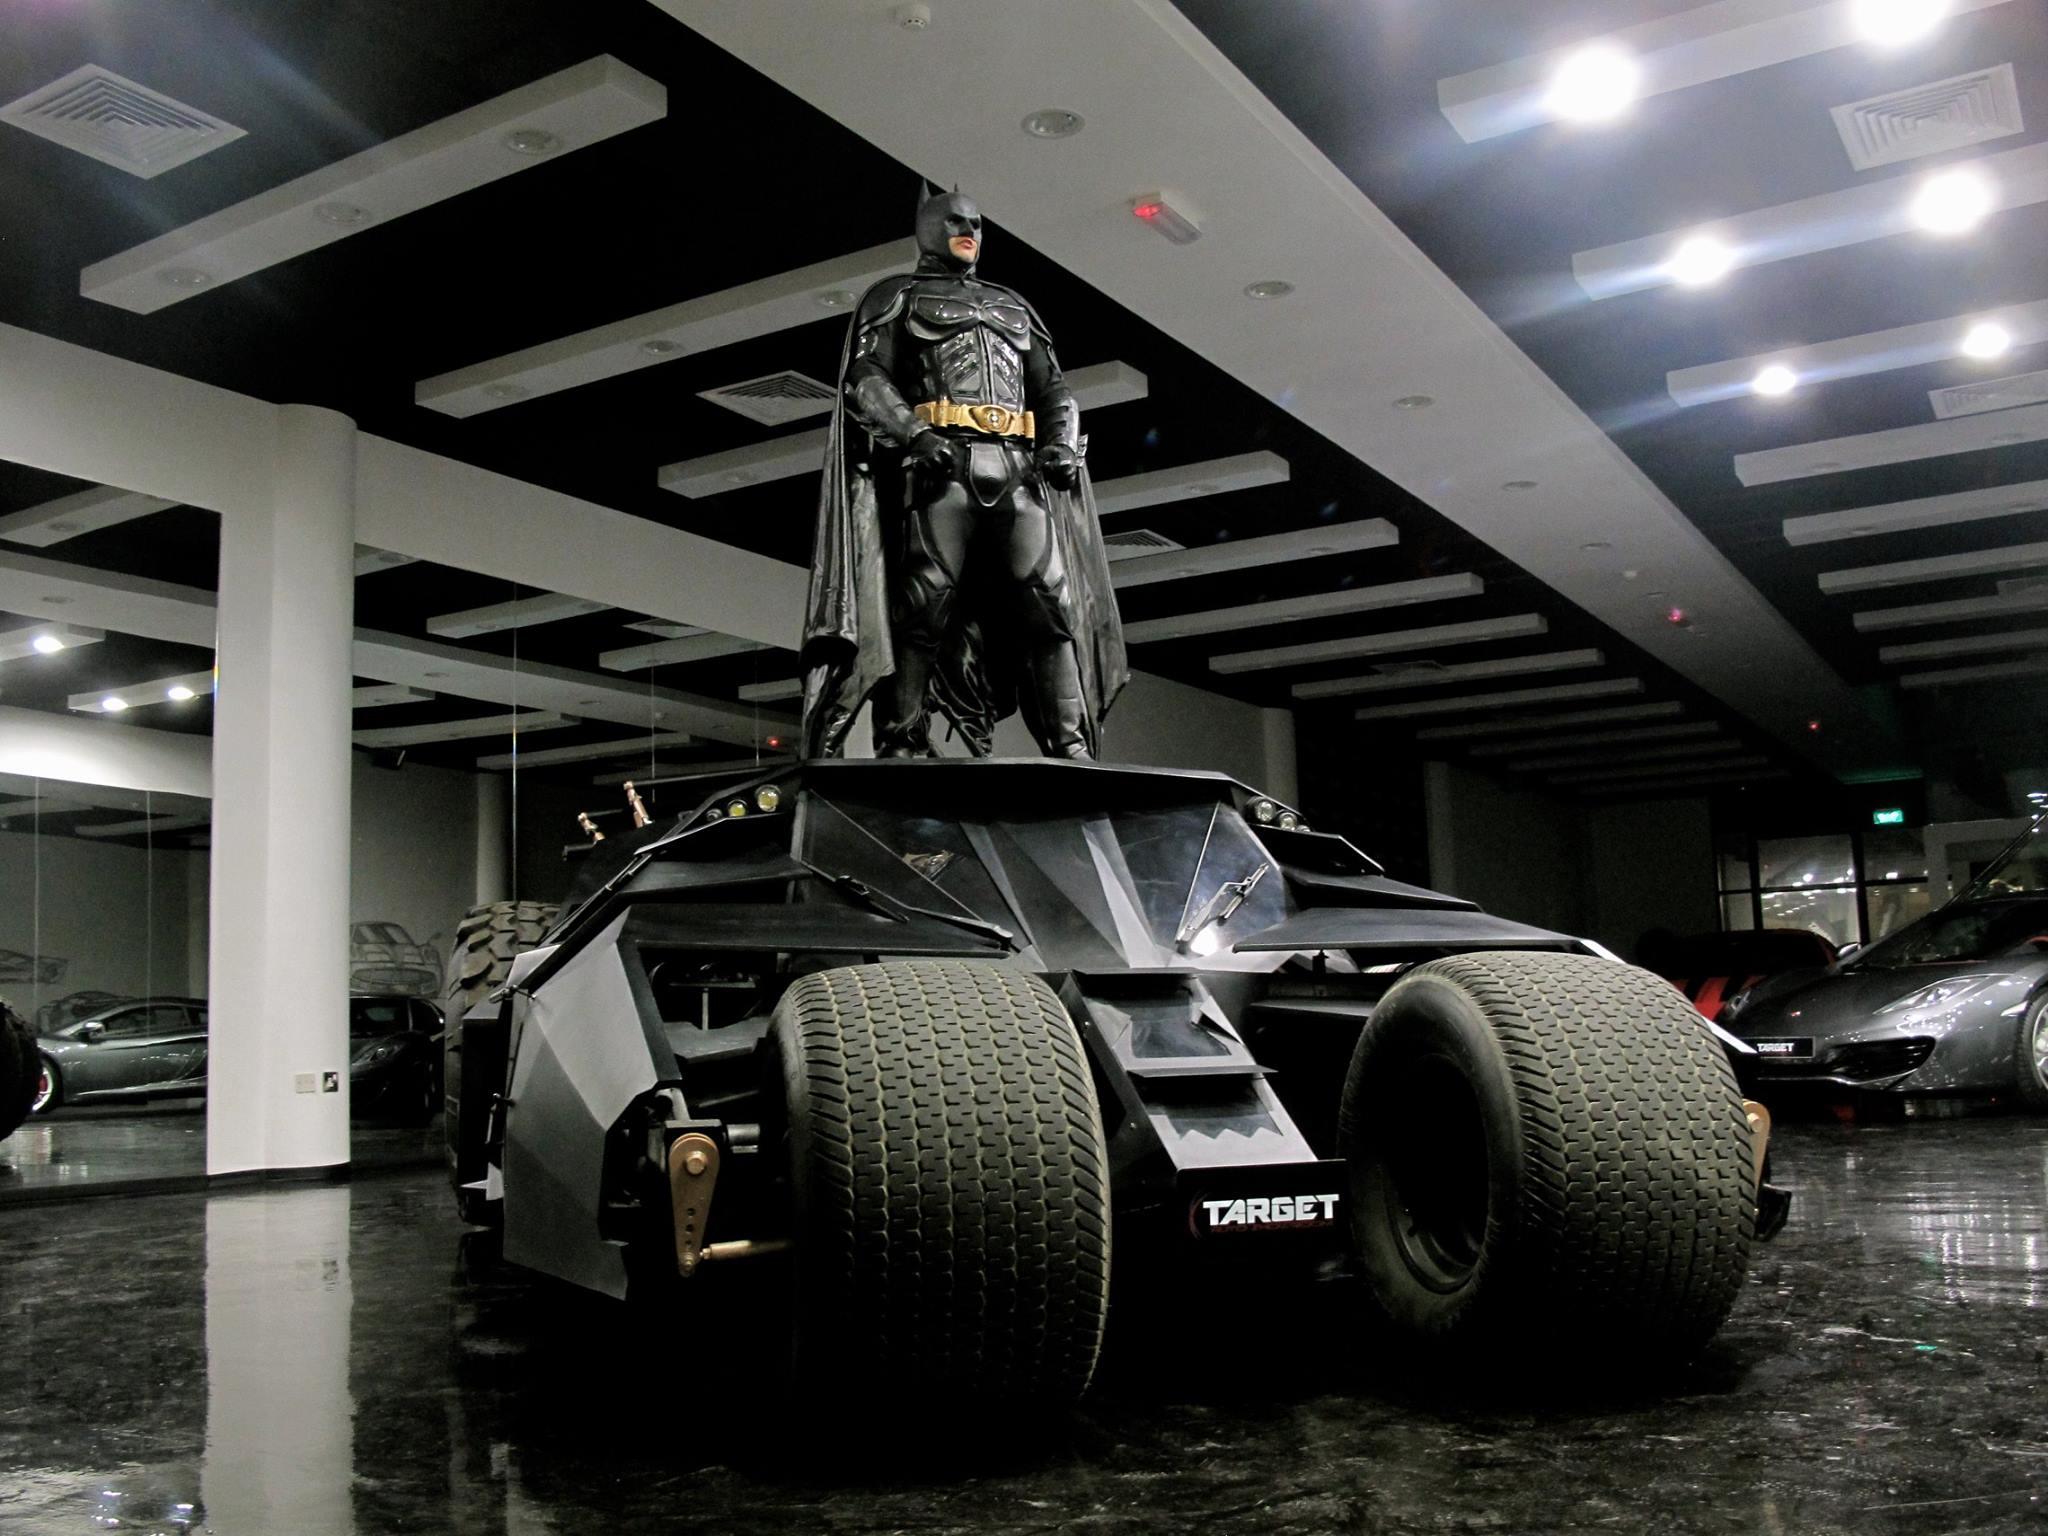 Elon Musk Car In Spac Wallpaper Tumbler Batmobile And Tron Bike For Sale In Dubai Luxury